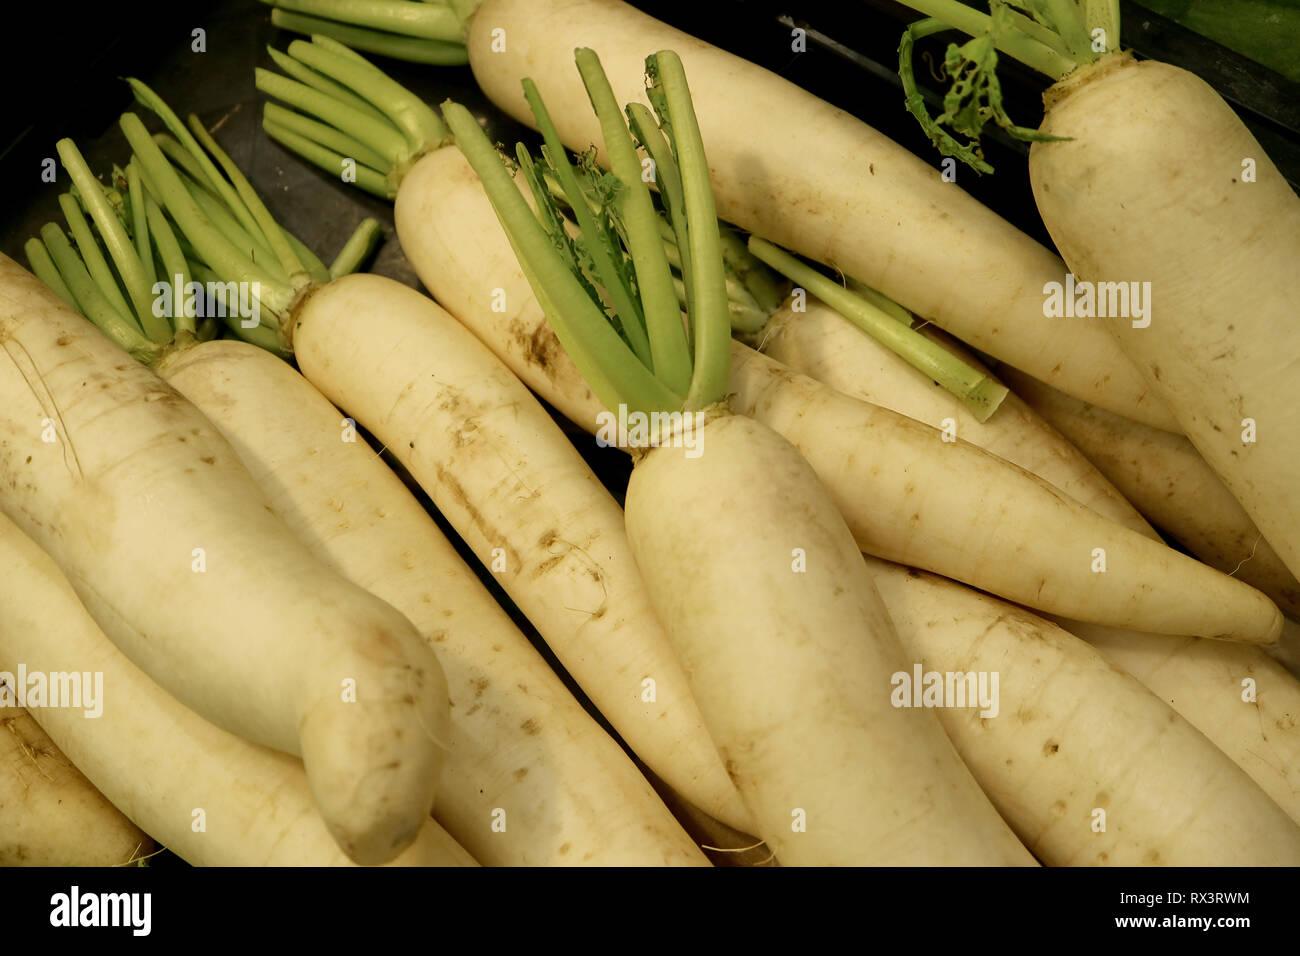 Heap of Fresh White Radish or Daikon Radish - Stock Image